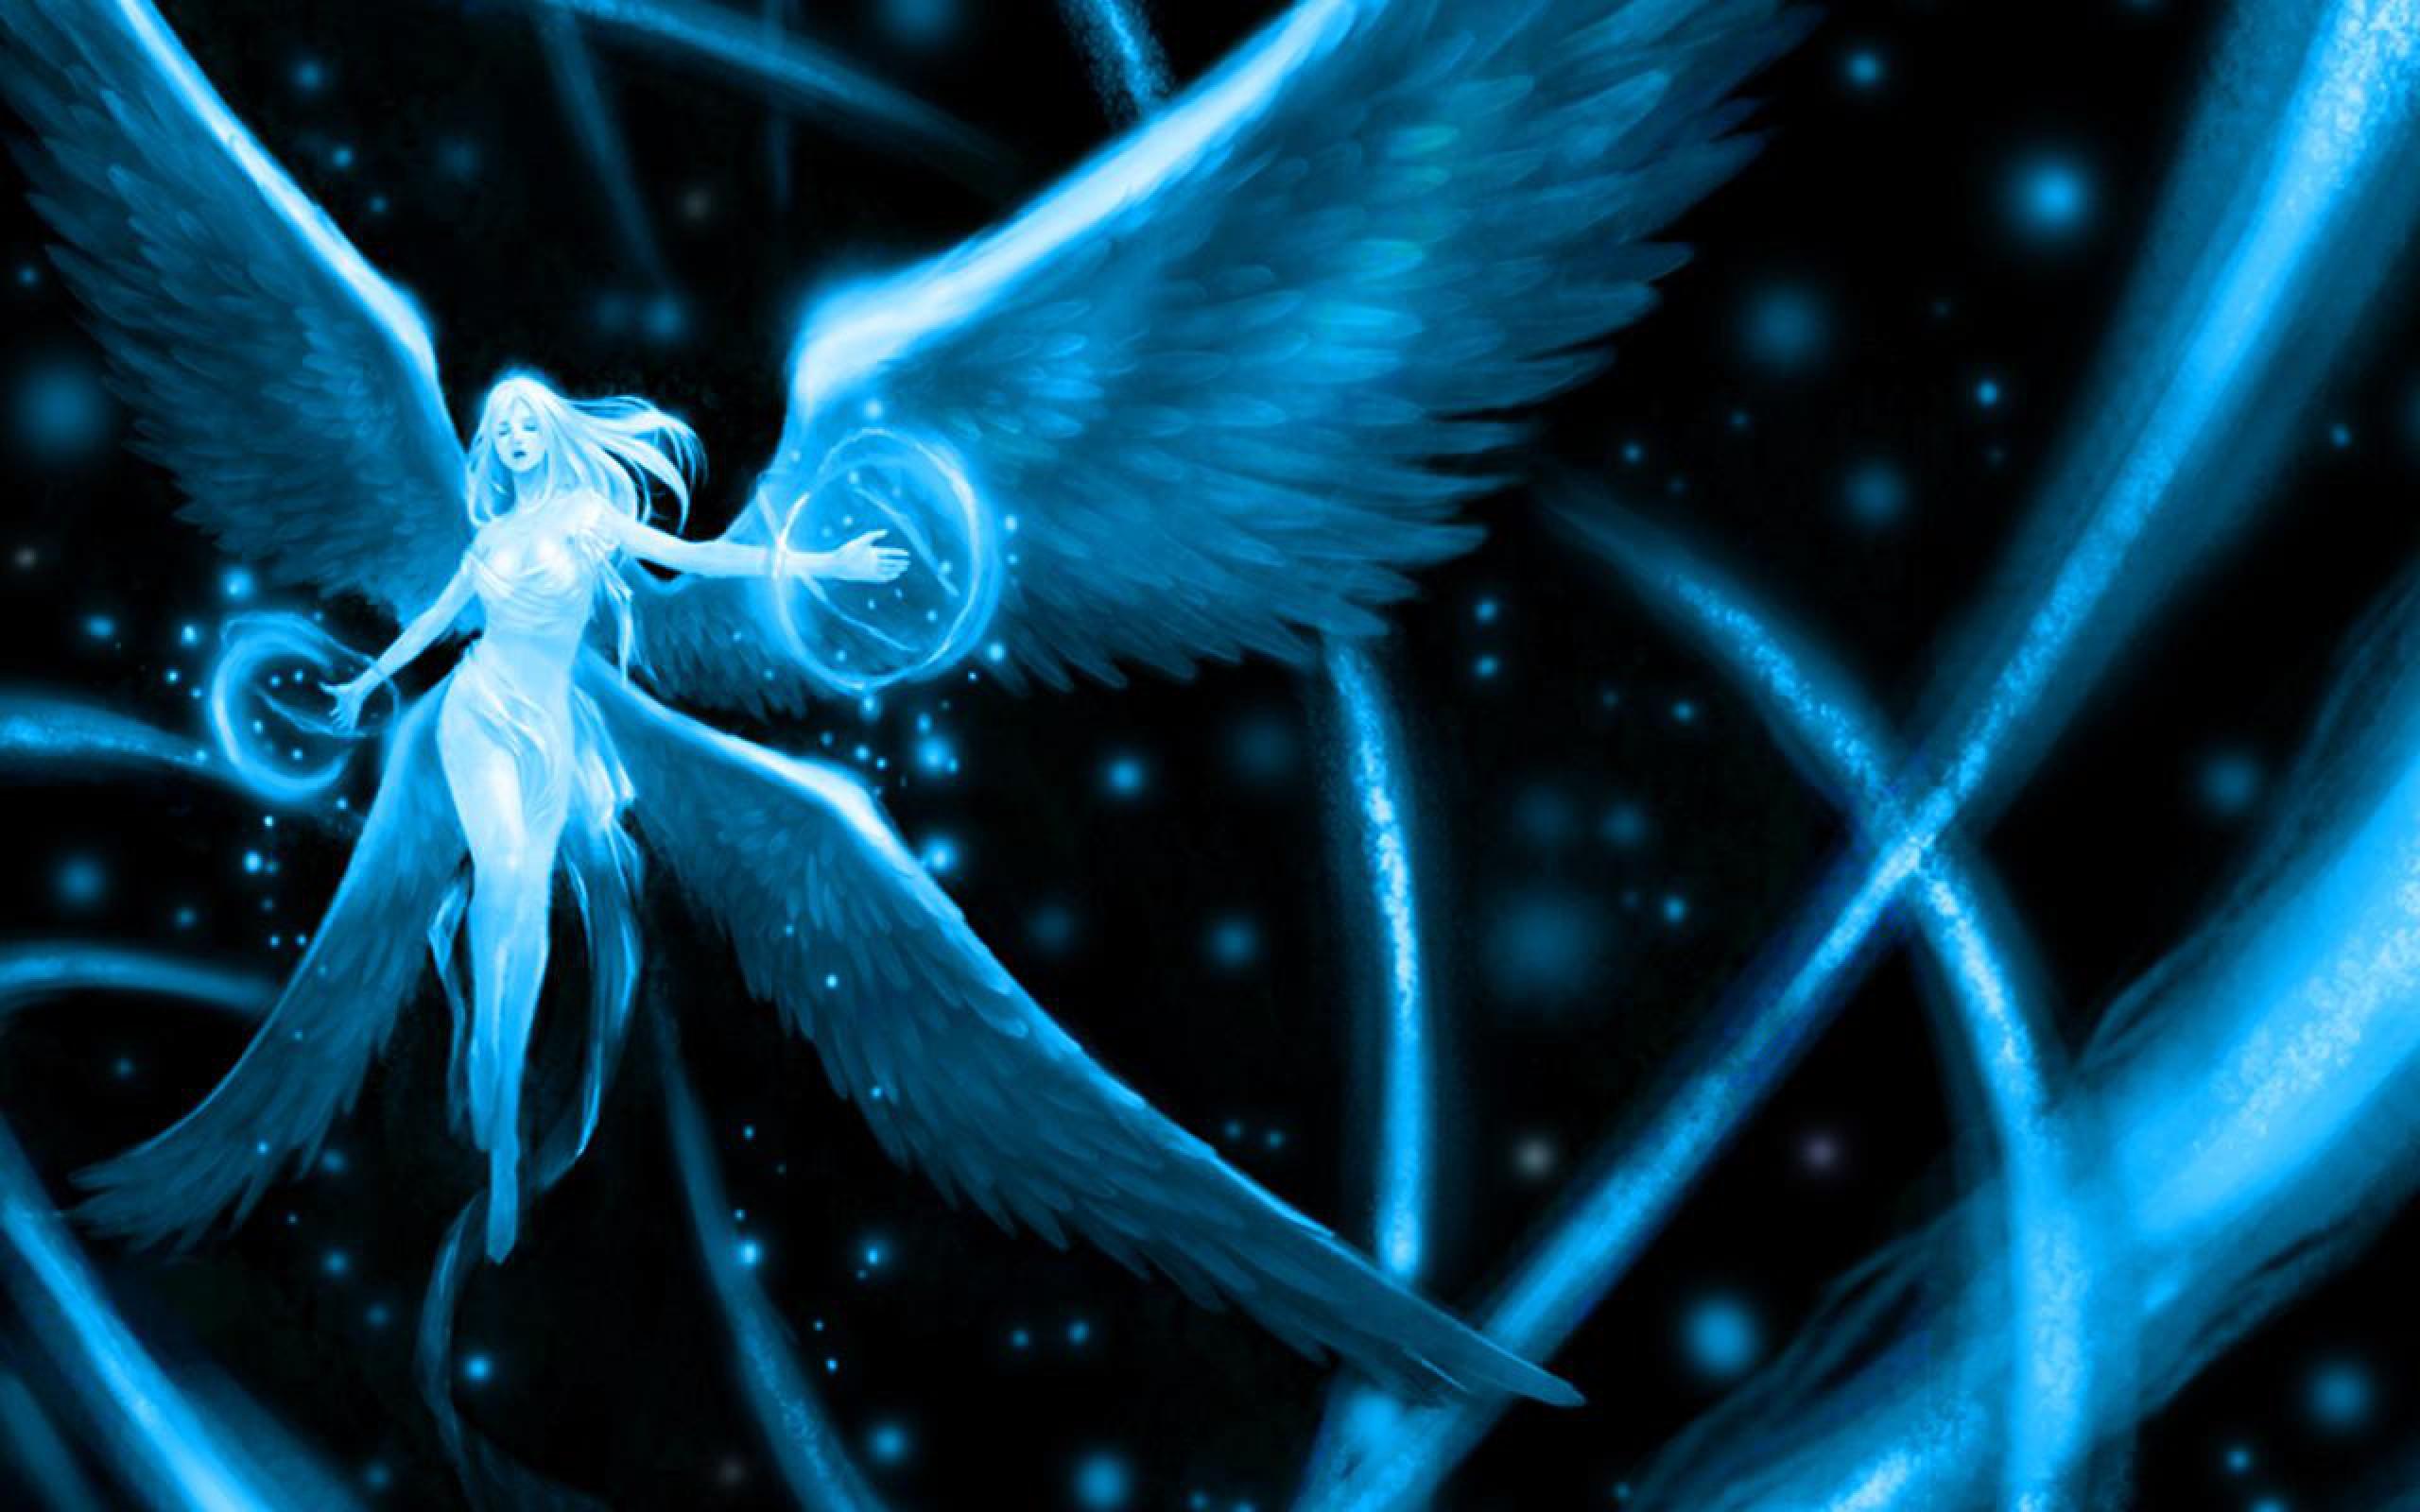 Angel Wallpapers HD 2560x1600